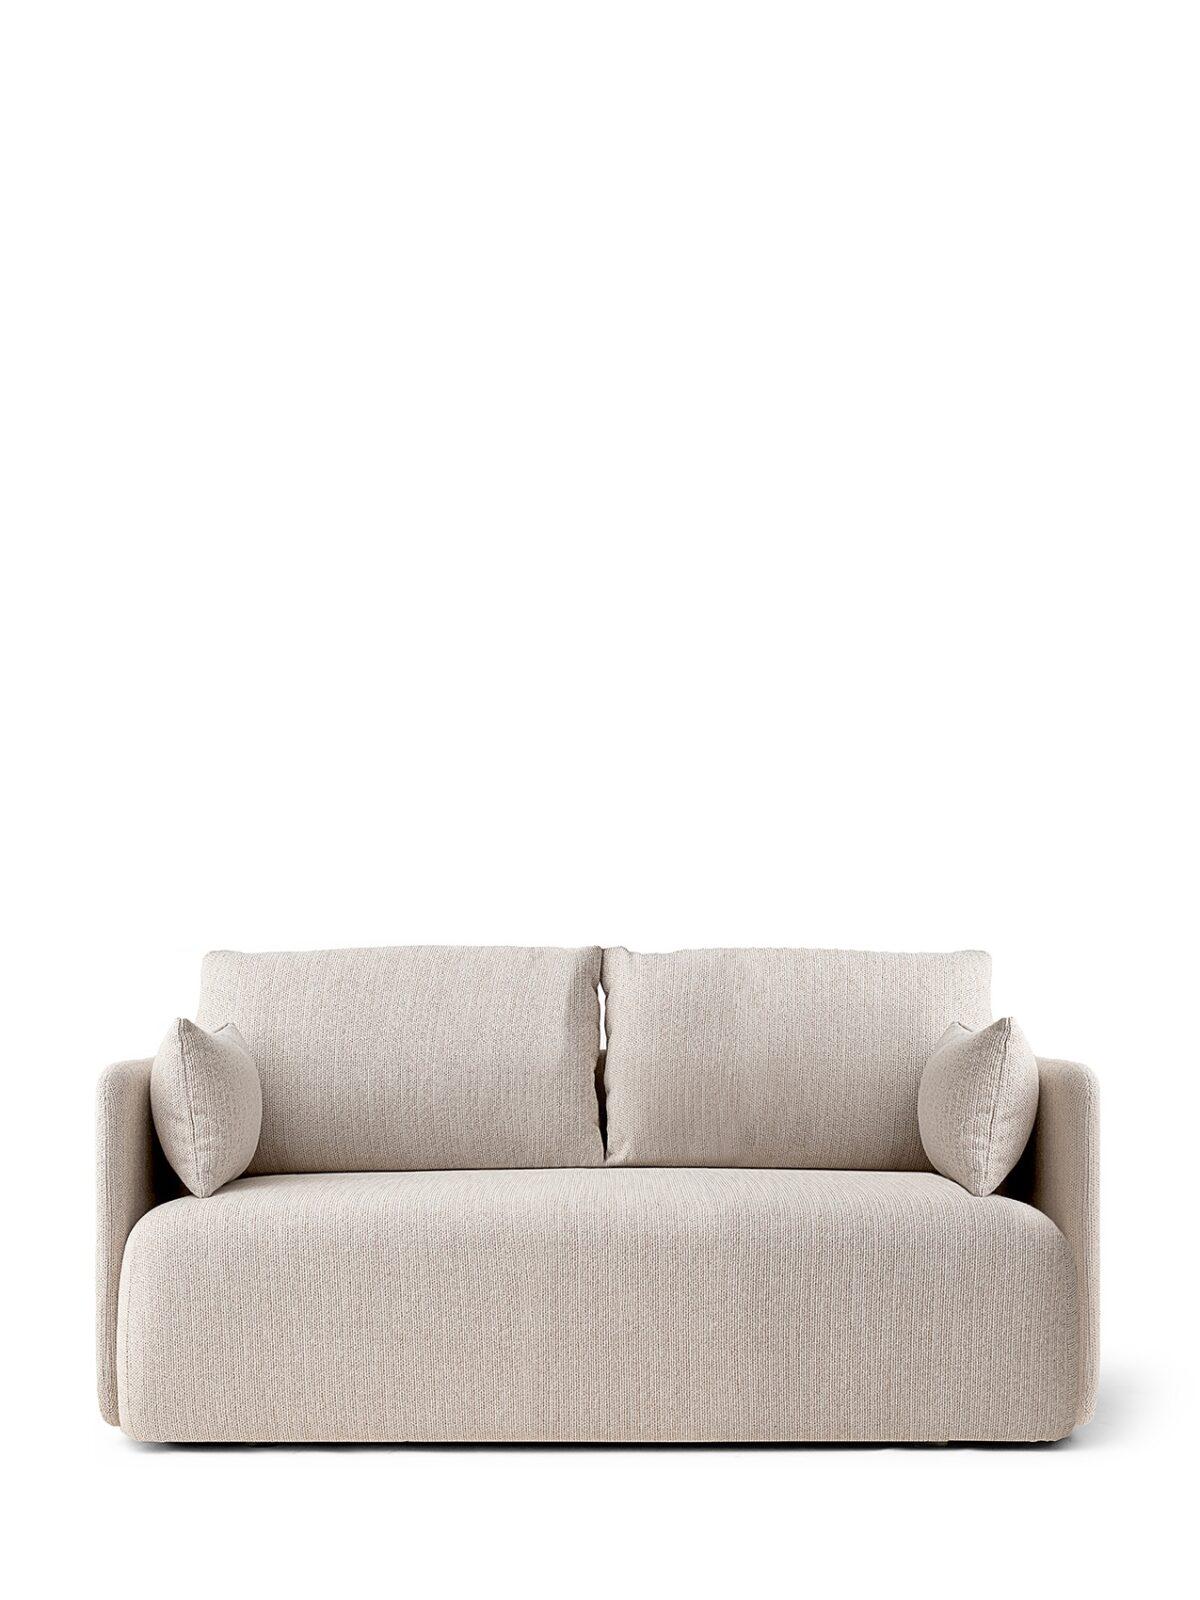 9850029 Offset Sofa 2 Seater Savannah 202 front2019 06 25 13 56 34 142 1